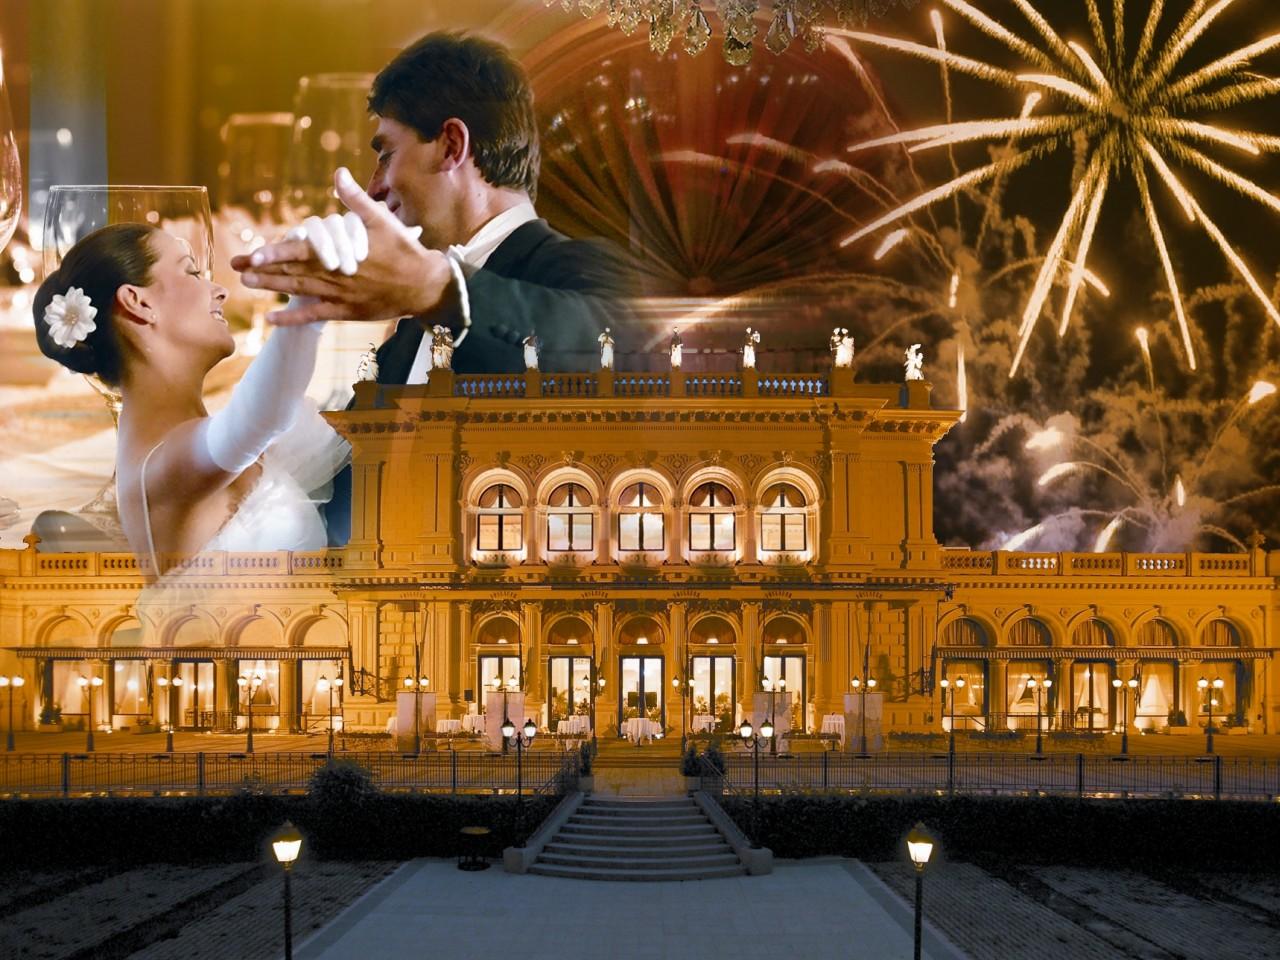 New Year in Imperial Vienna: 30 Dec 2019